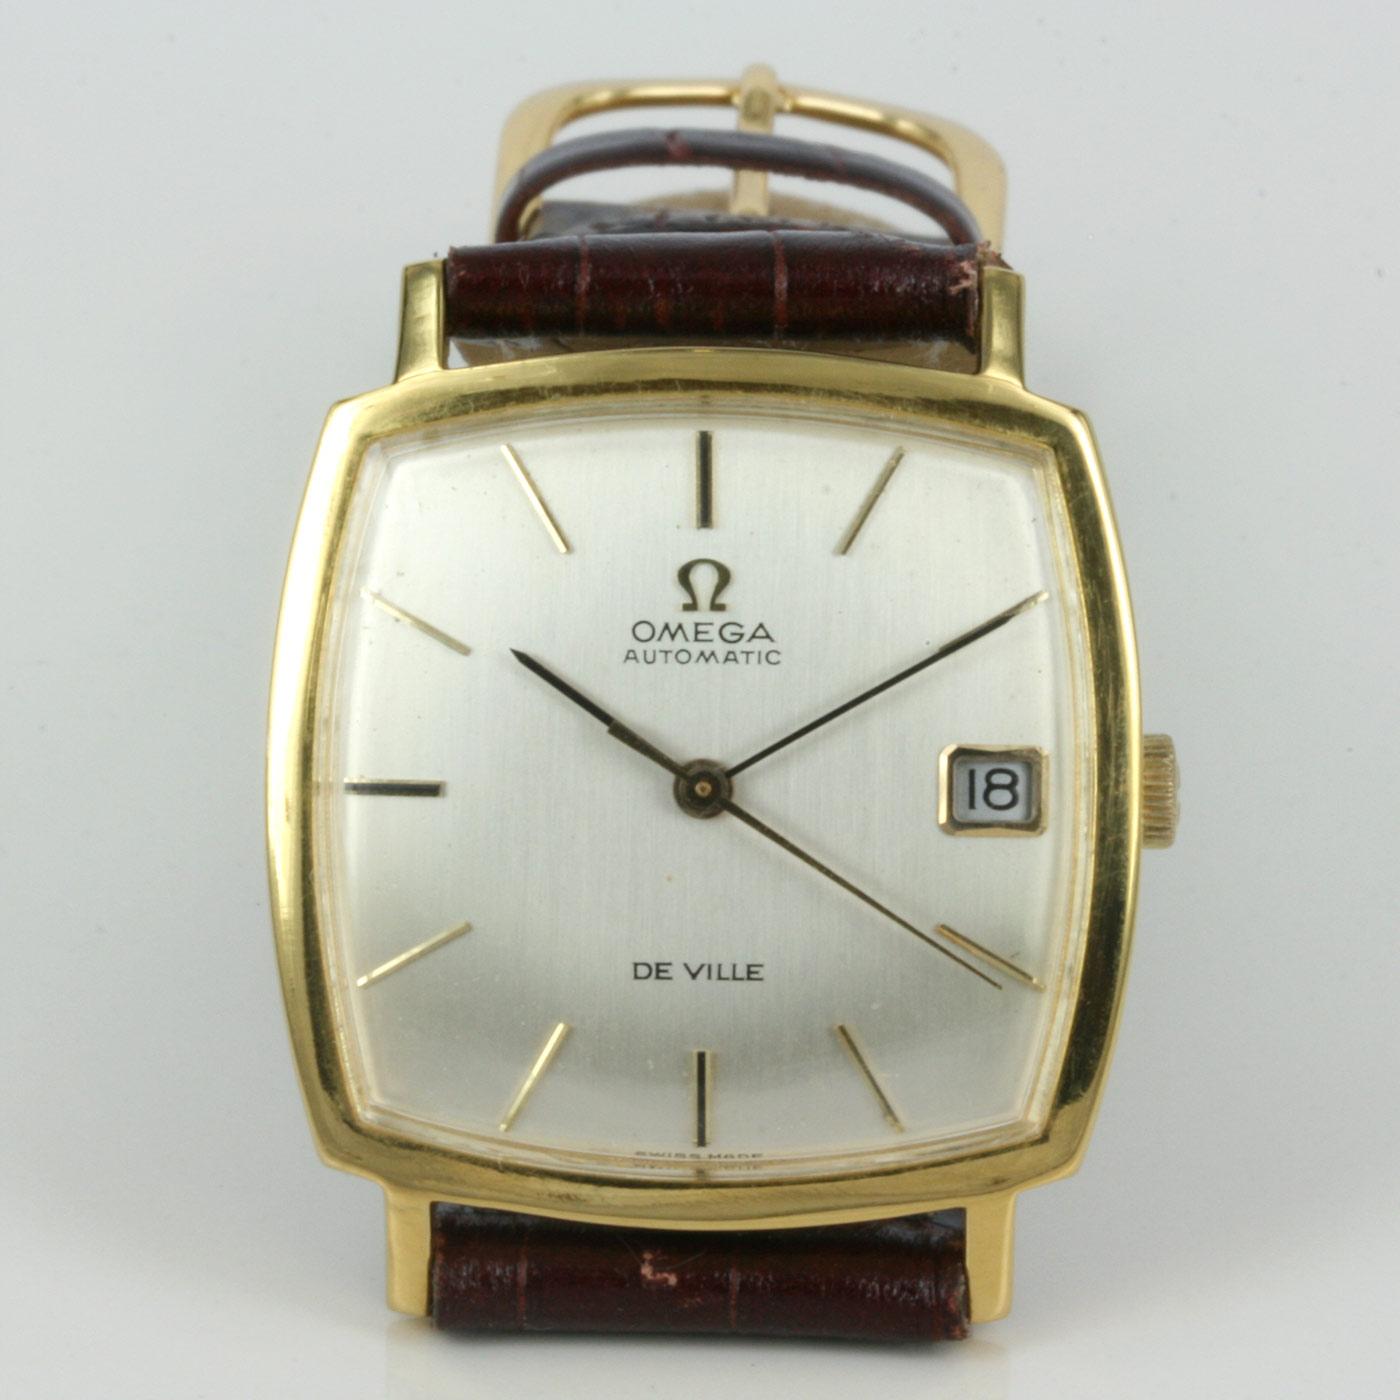 330f92e1c1fd Buy 1968 Omega De Ville watch. Sold Items